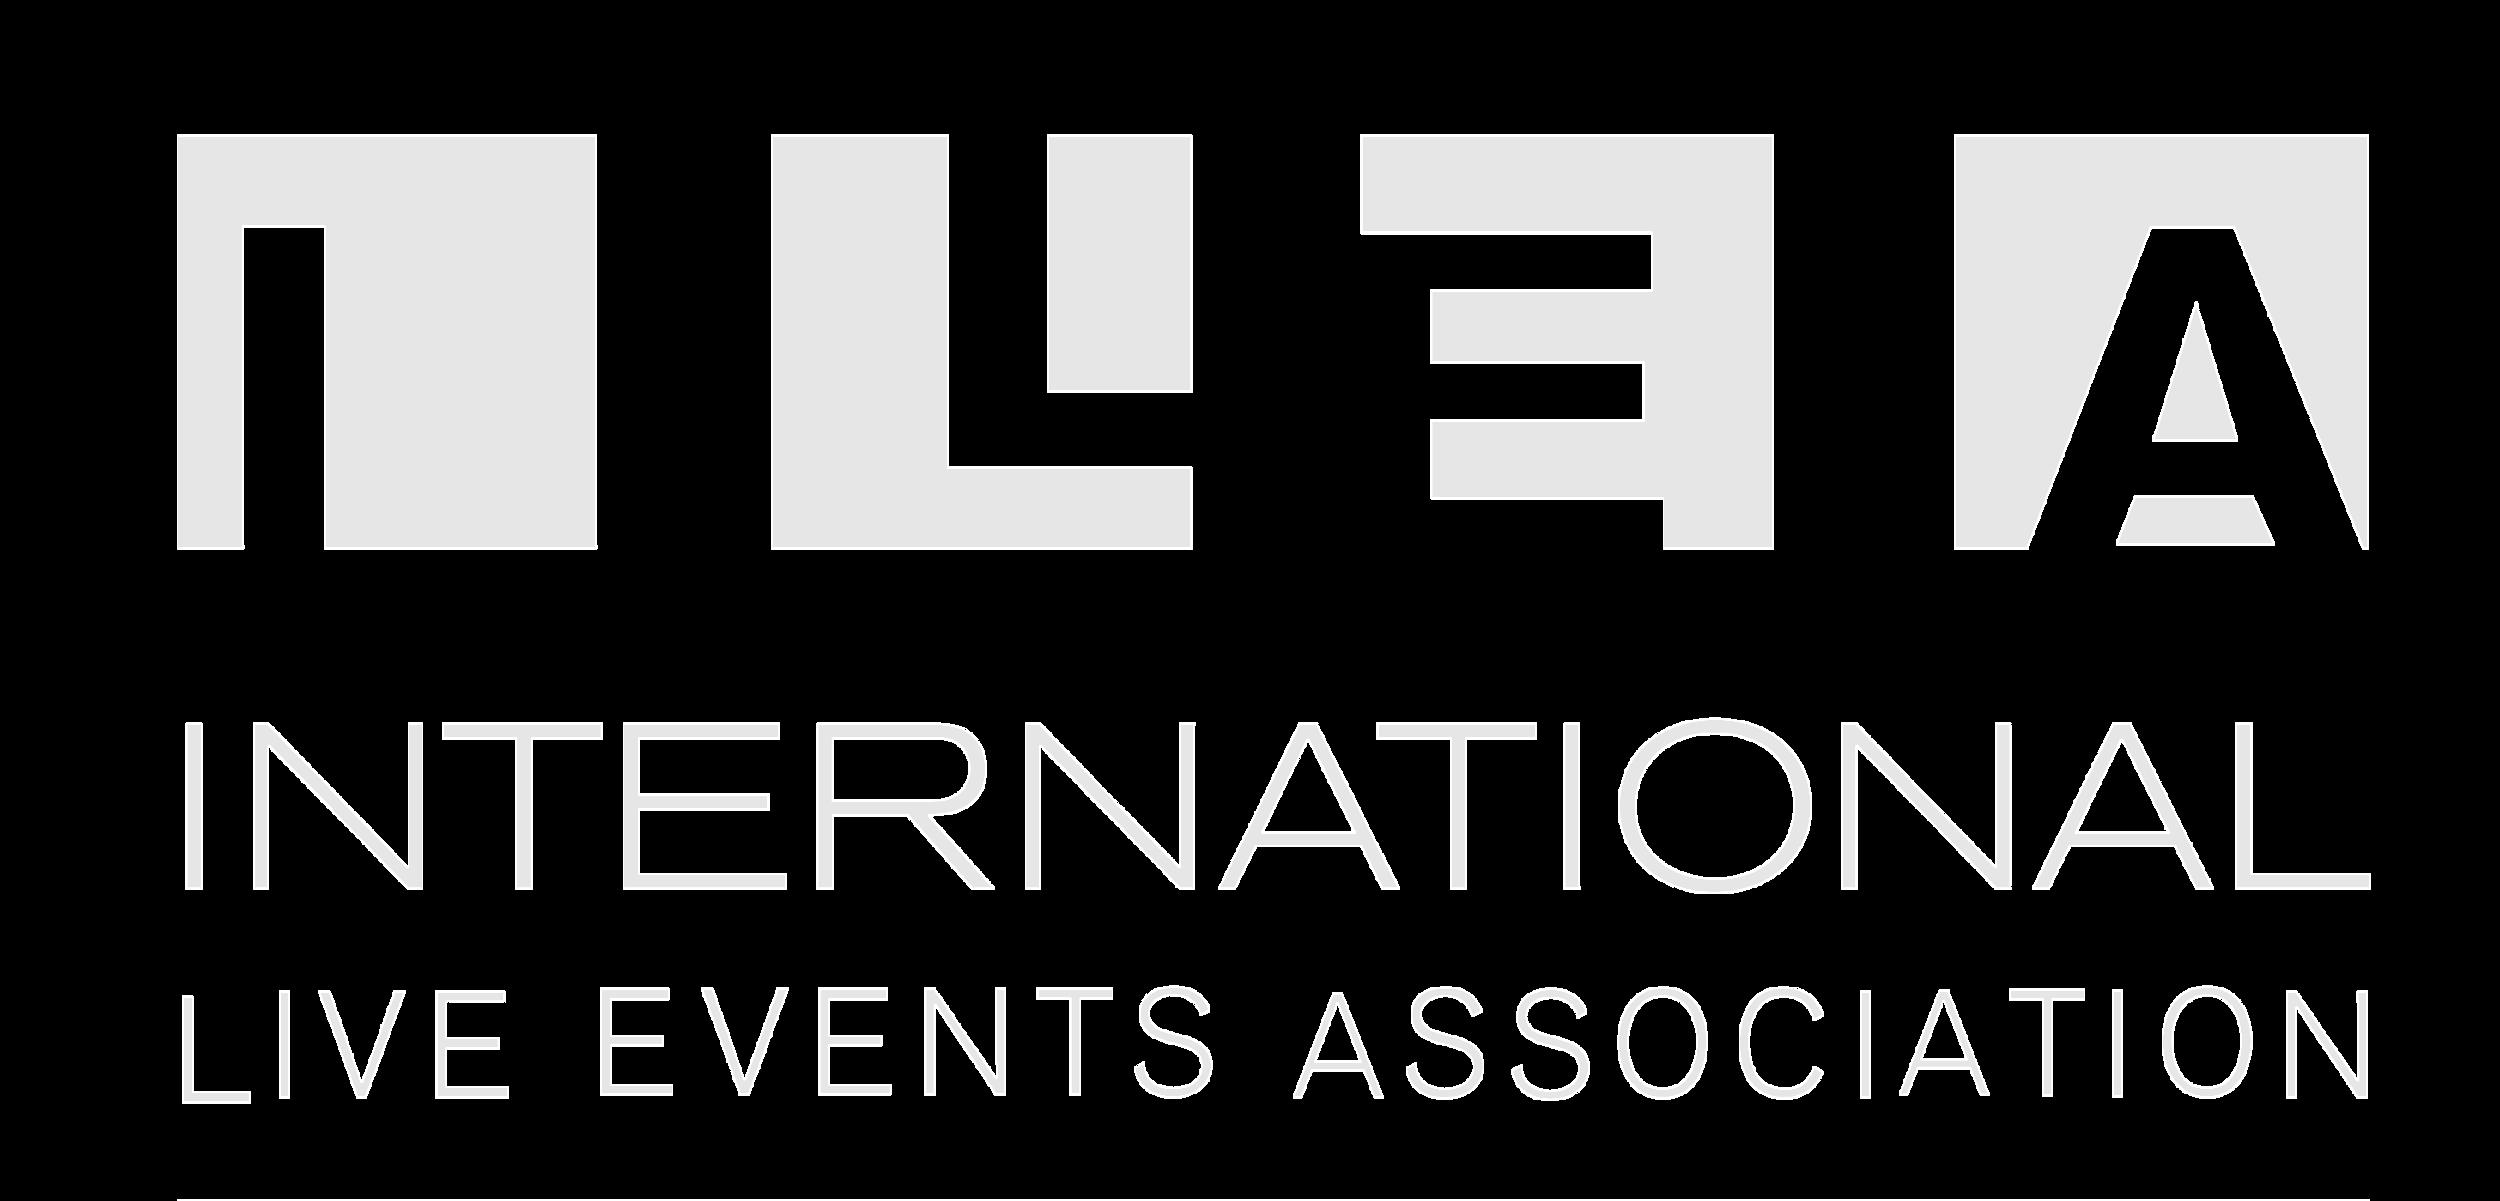 ILEA_logo_v2.png